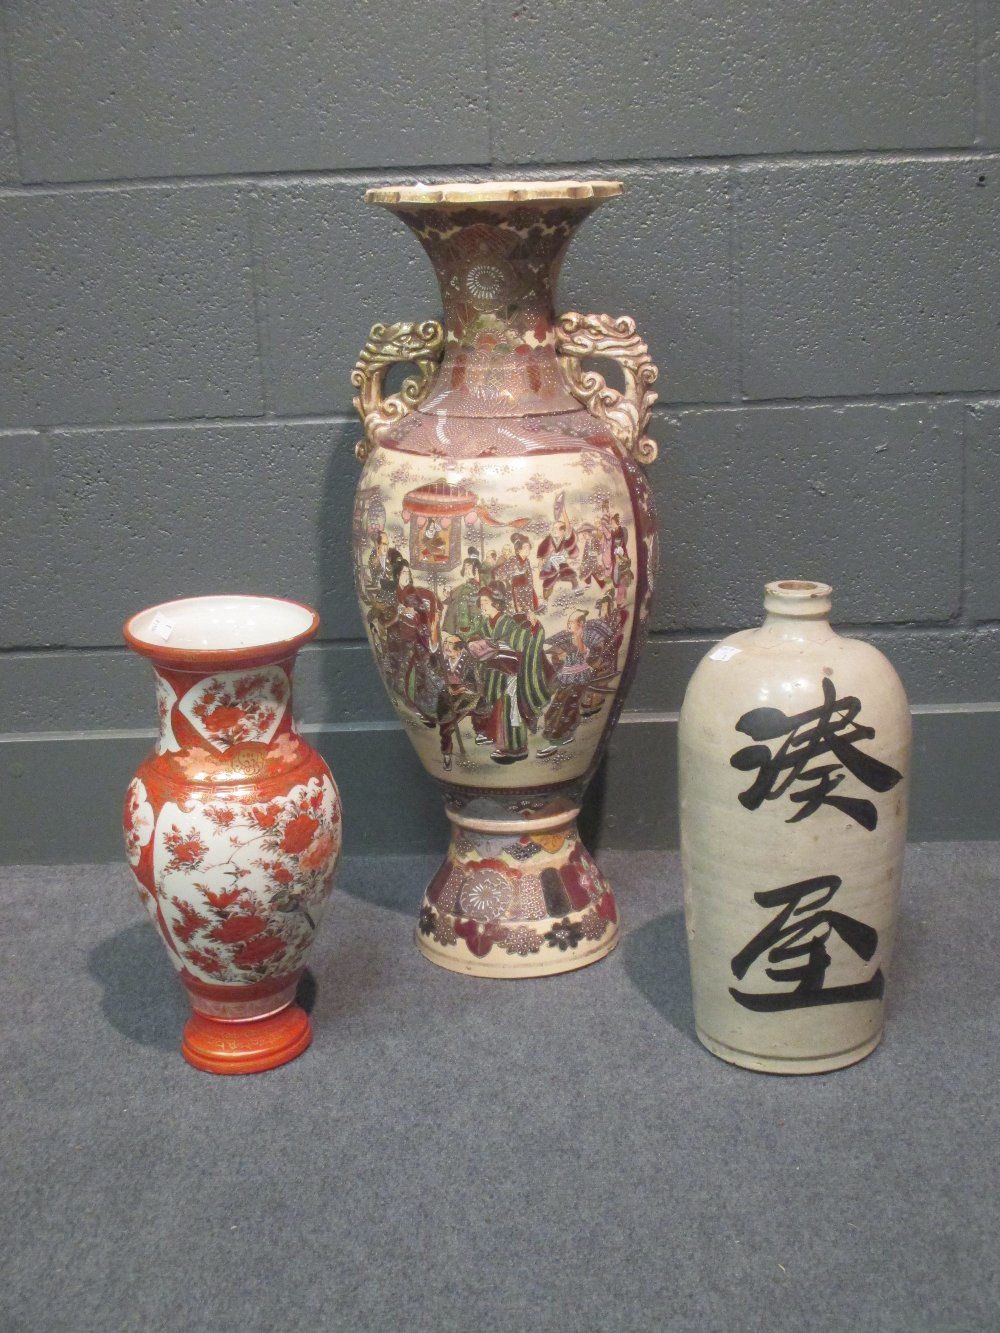 Lot 61 - A Satsuma vase, a Kutani vase and another vase